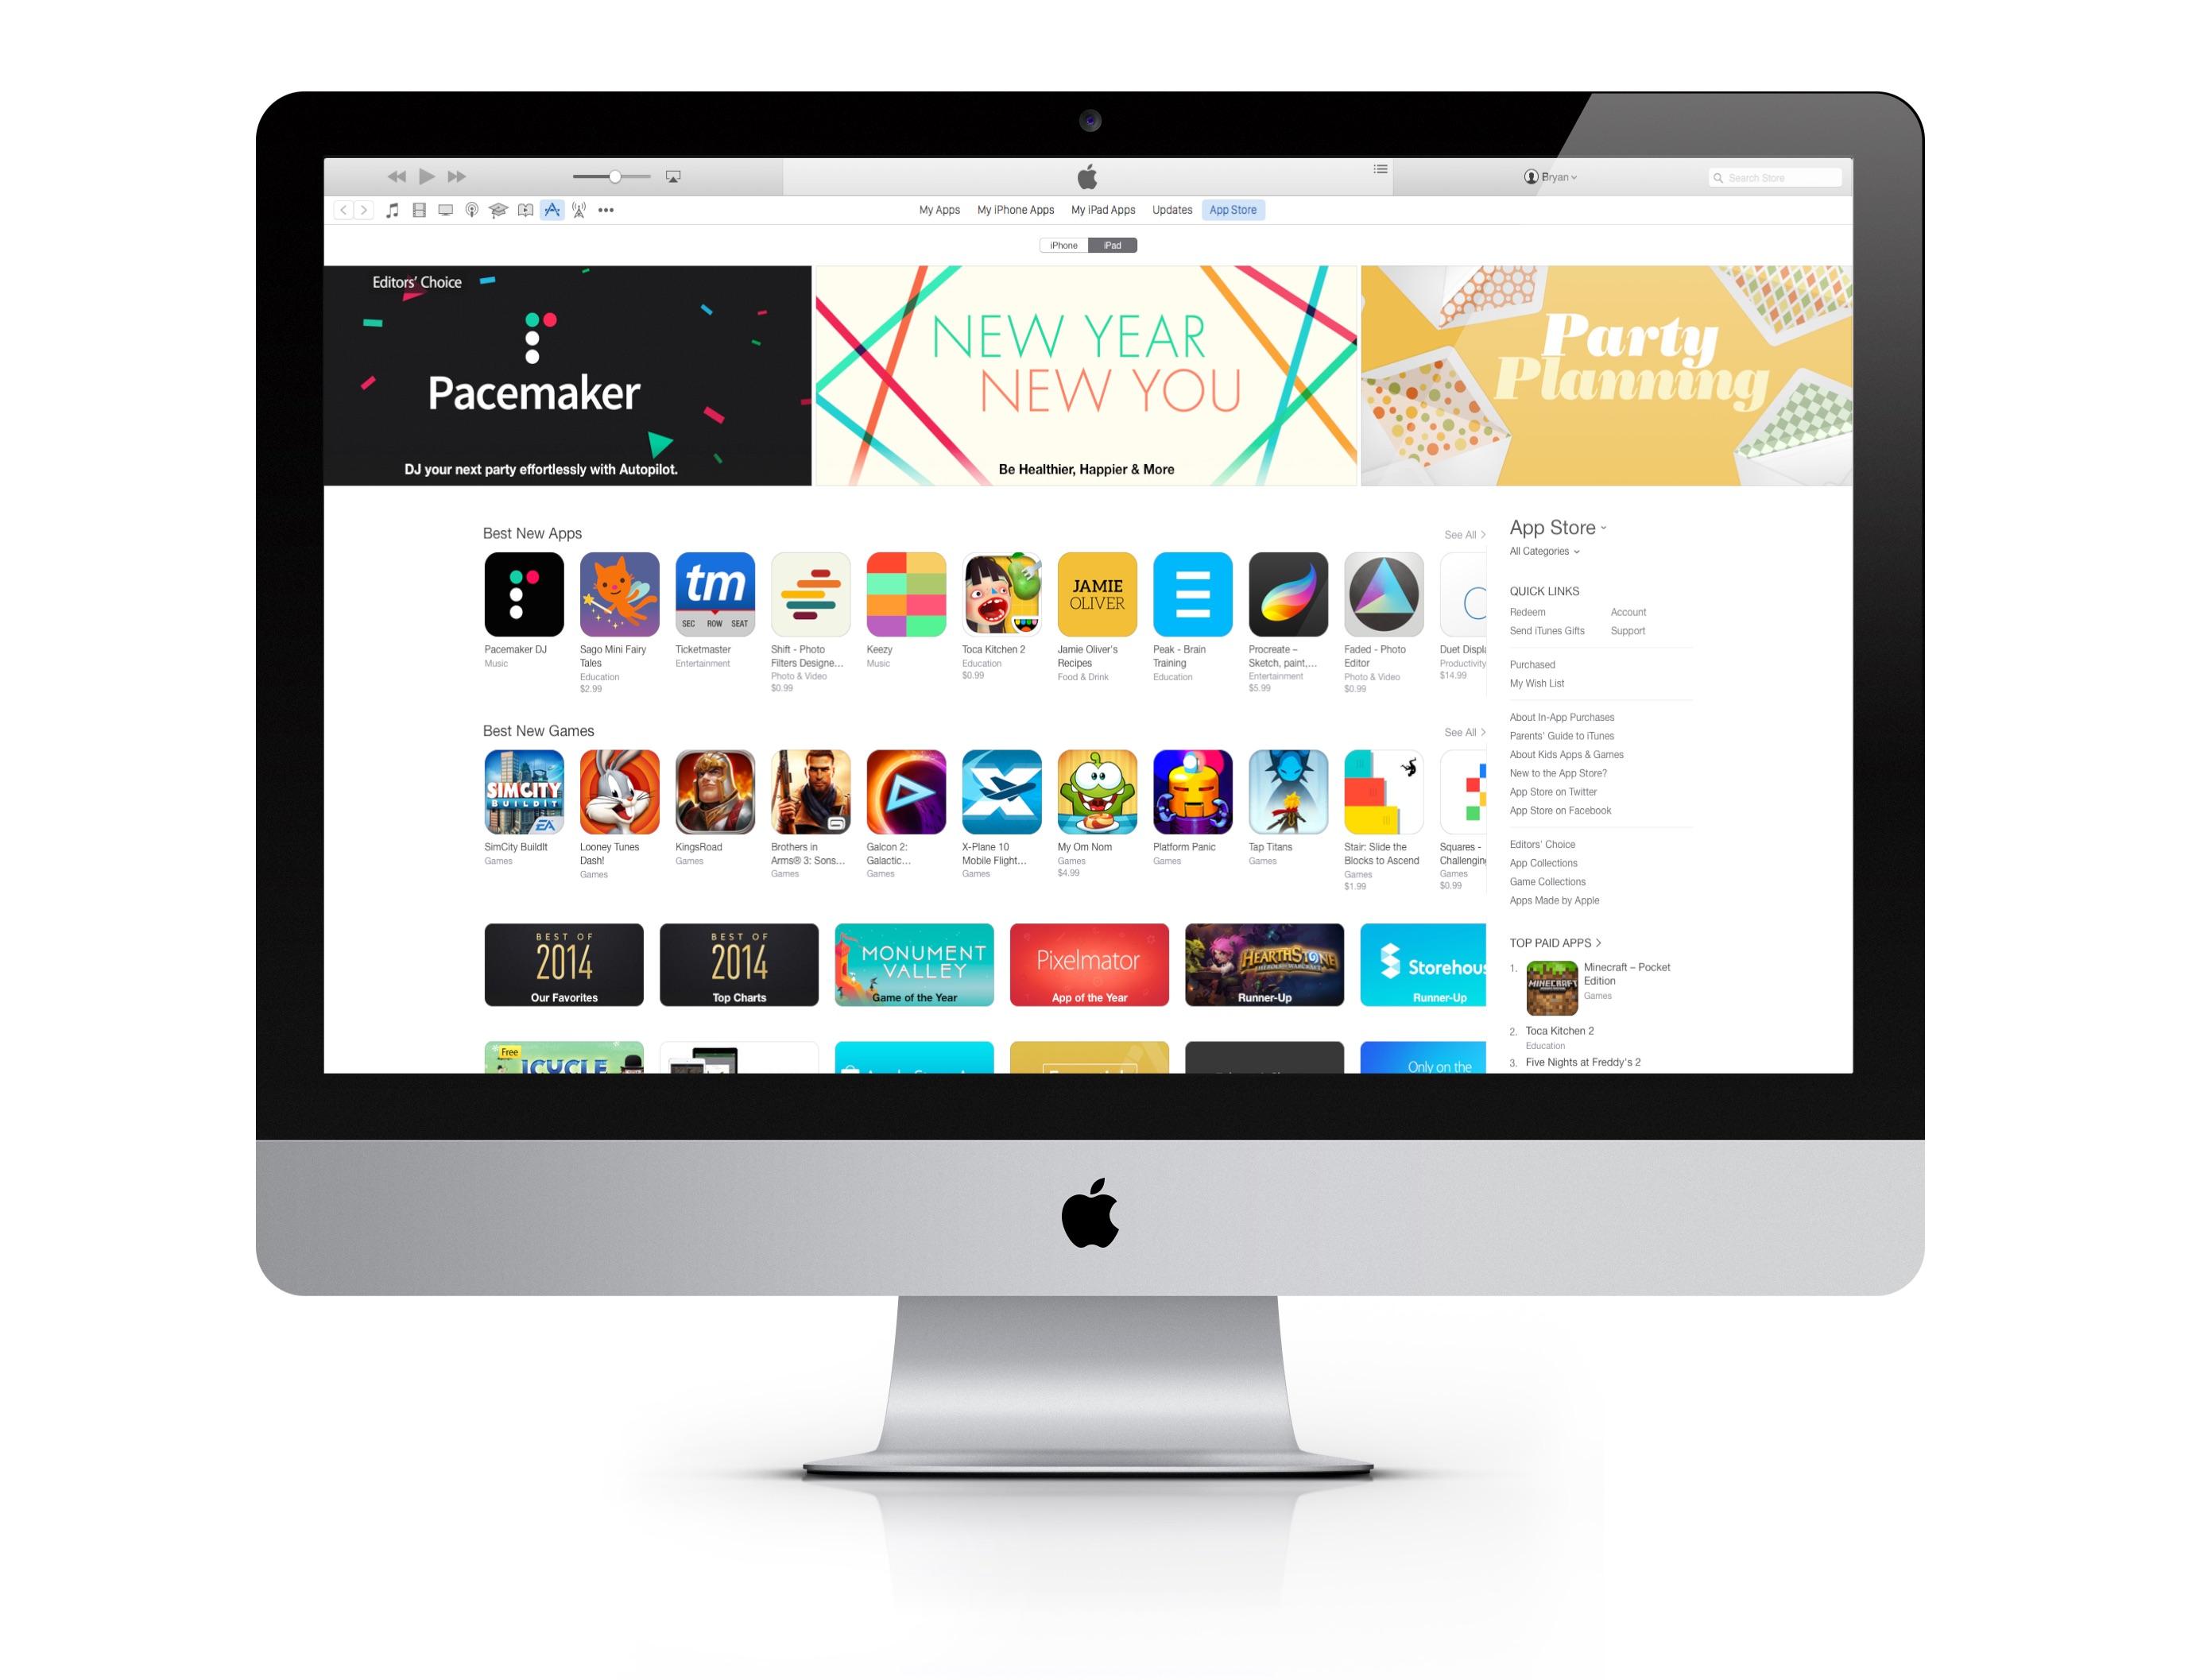 Apple announces impressive App Store numbers